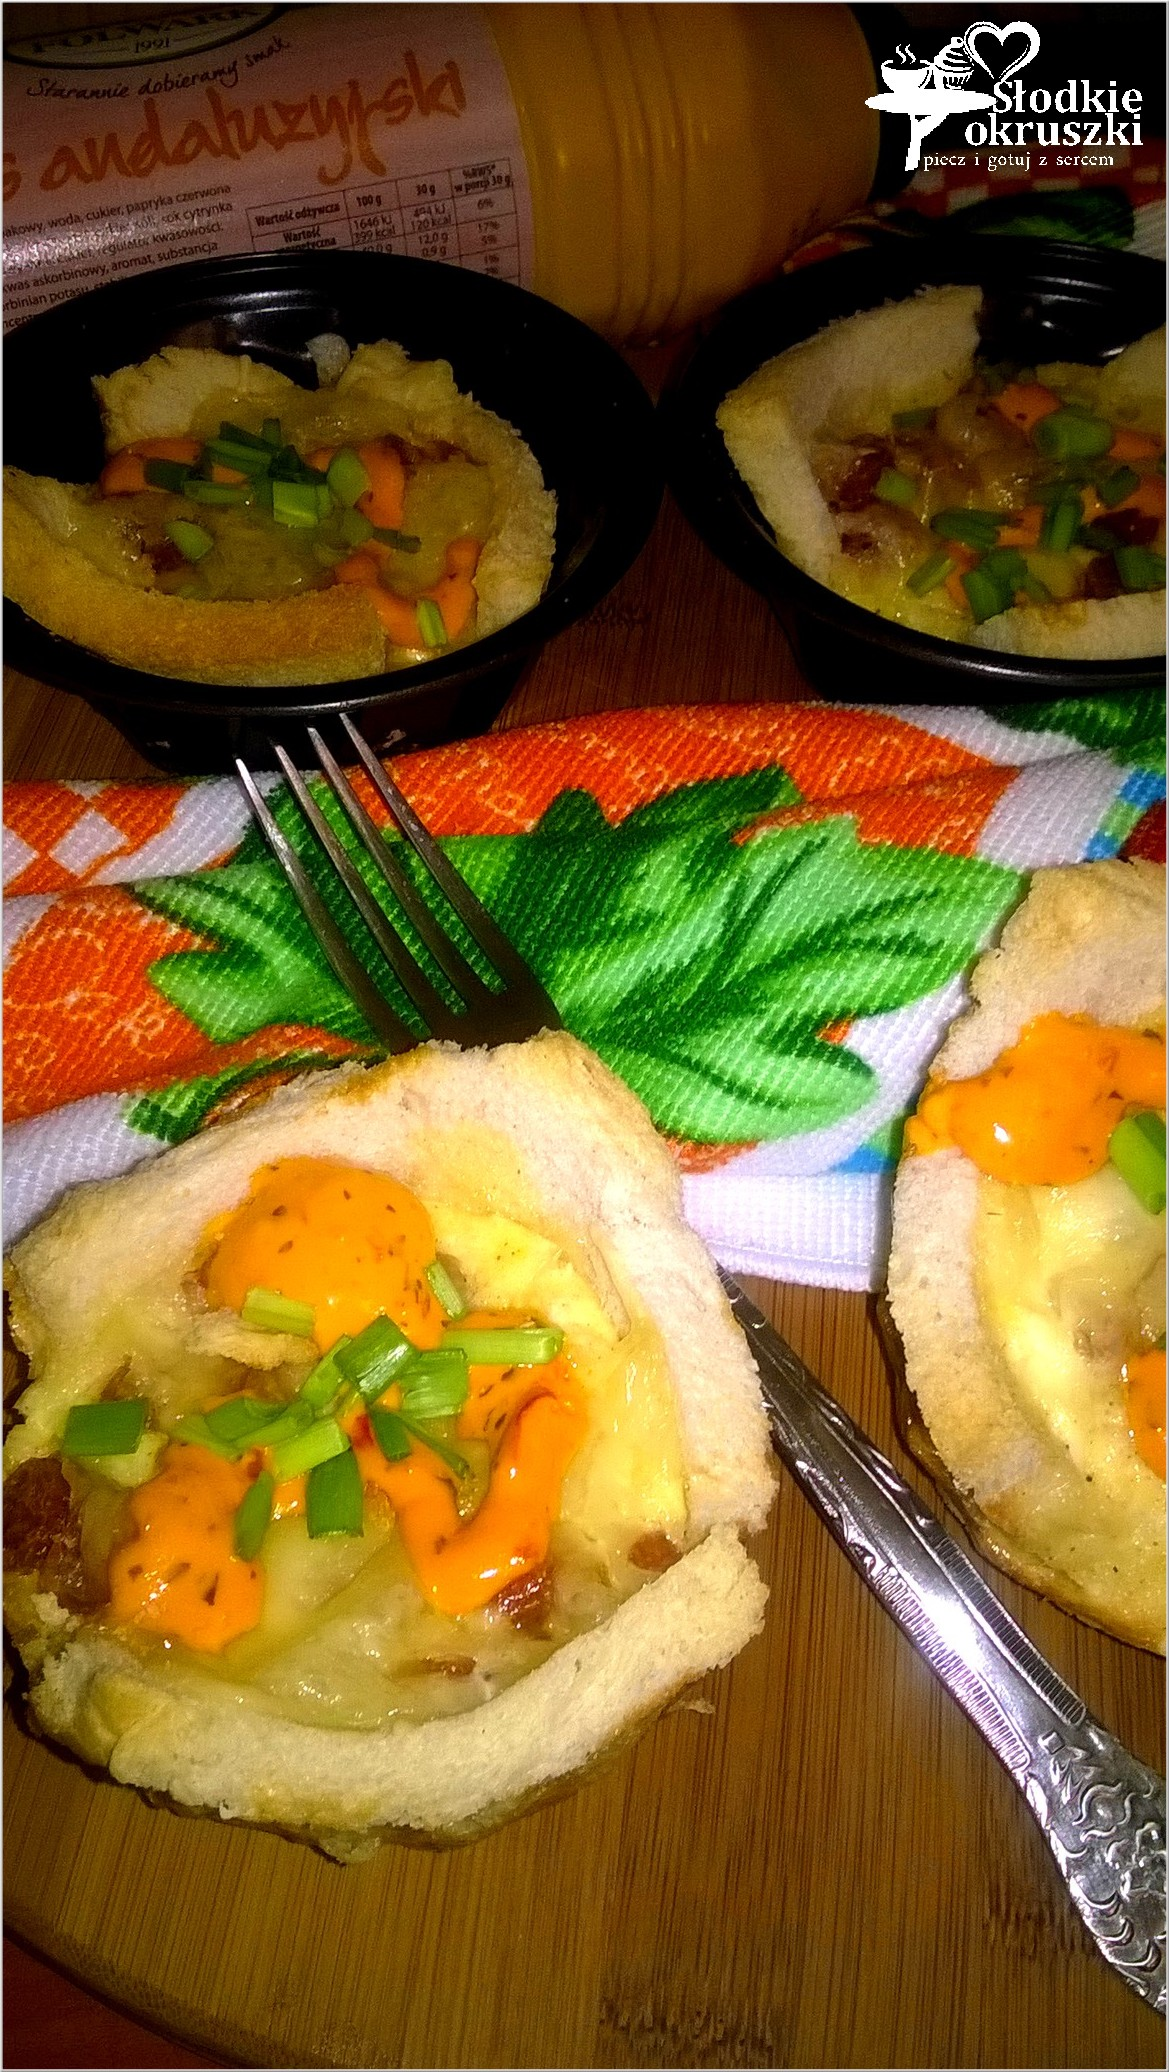 Tostowe babeczki z kabanosem i andaluzyjskim sosem 2